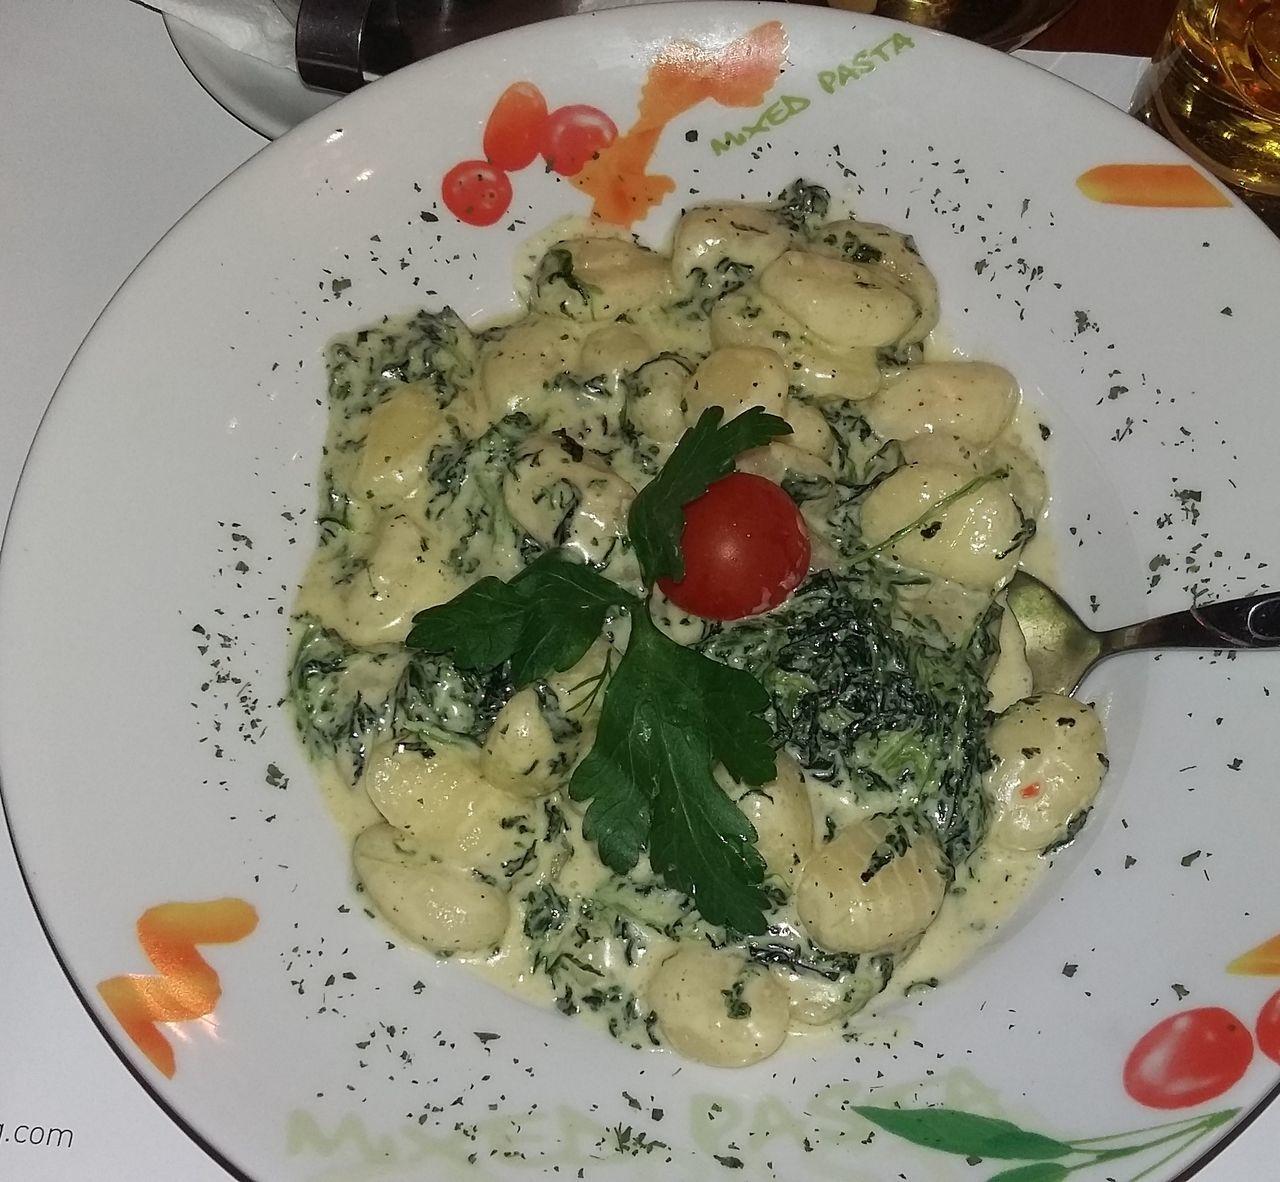 Christmas Dinner Italian Food Food Gnocci Spinach Foodporn Food Porn Foodphotography